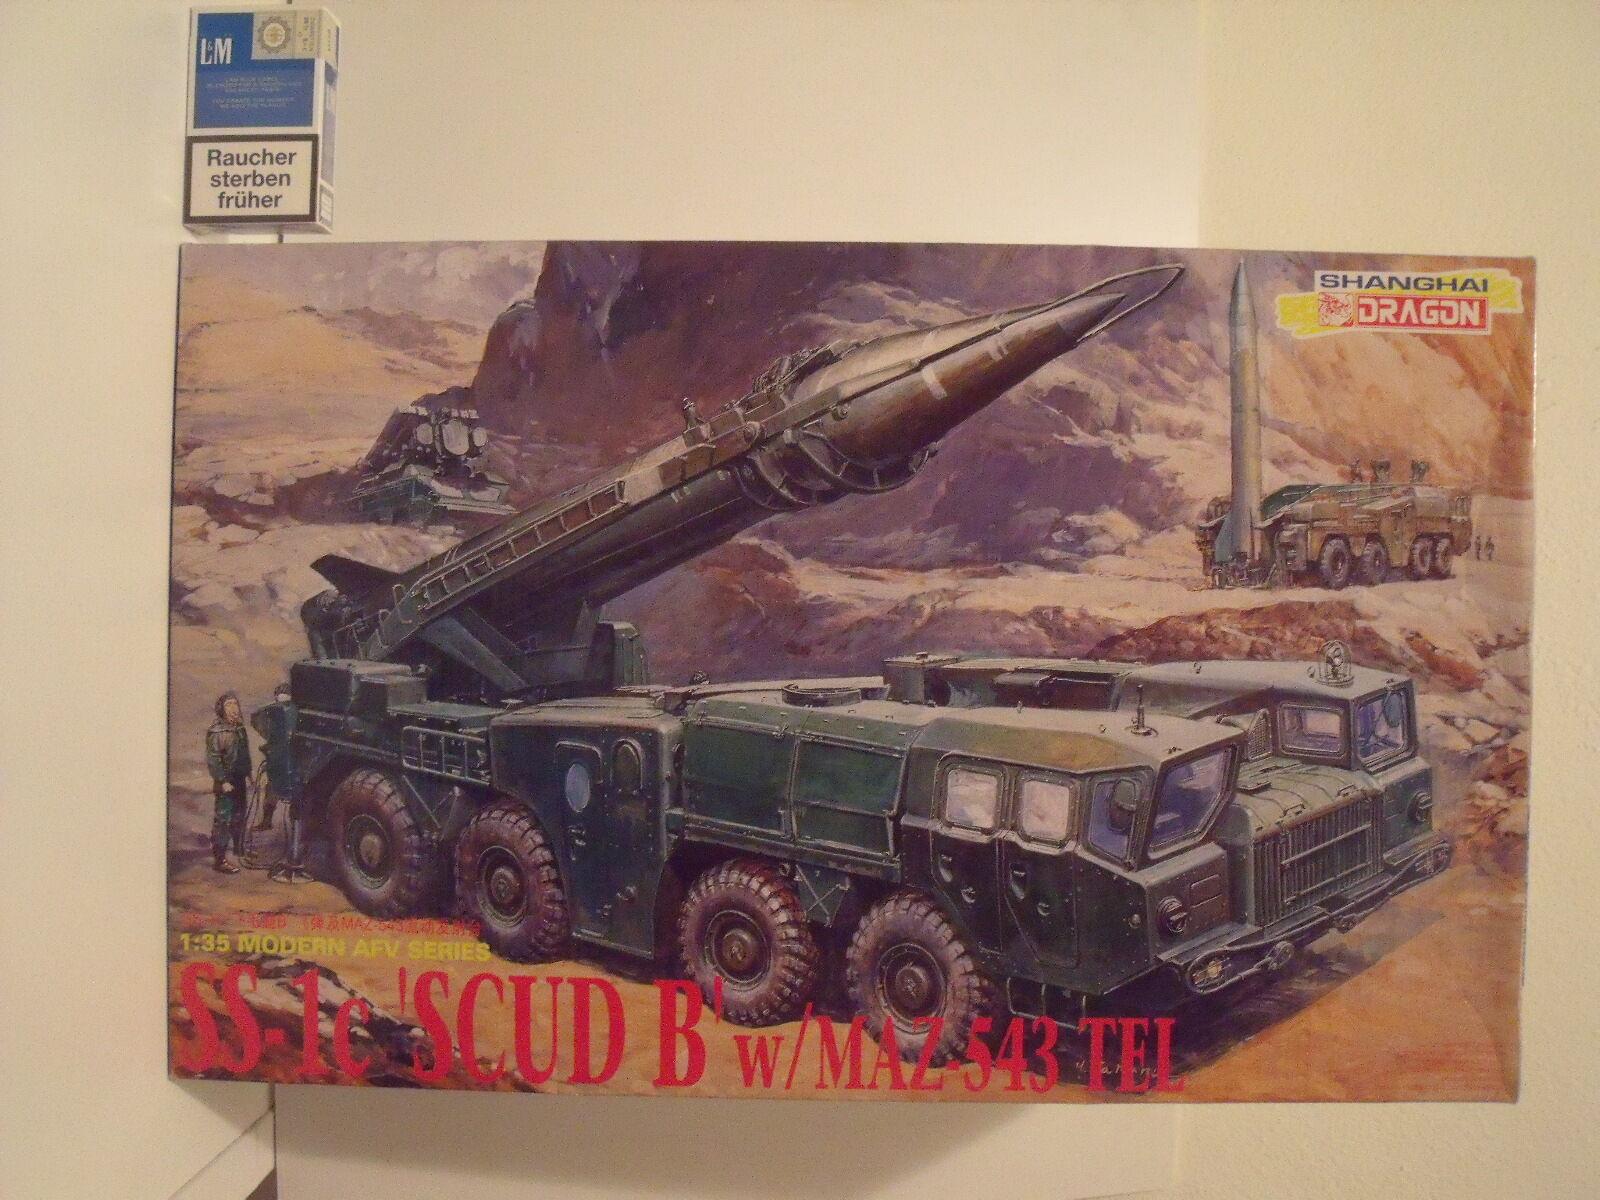 SS-1c  Scud B  with Maz-543 Tel 1 35